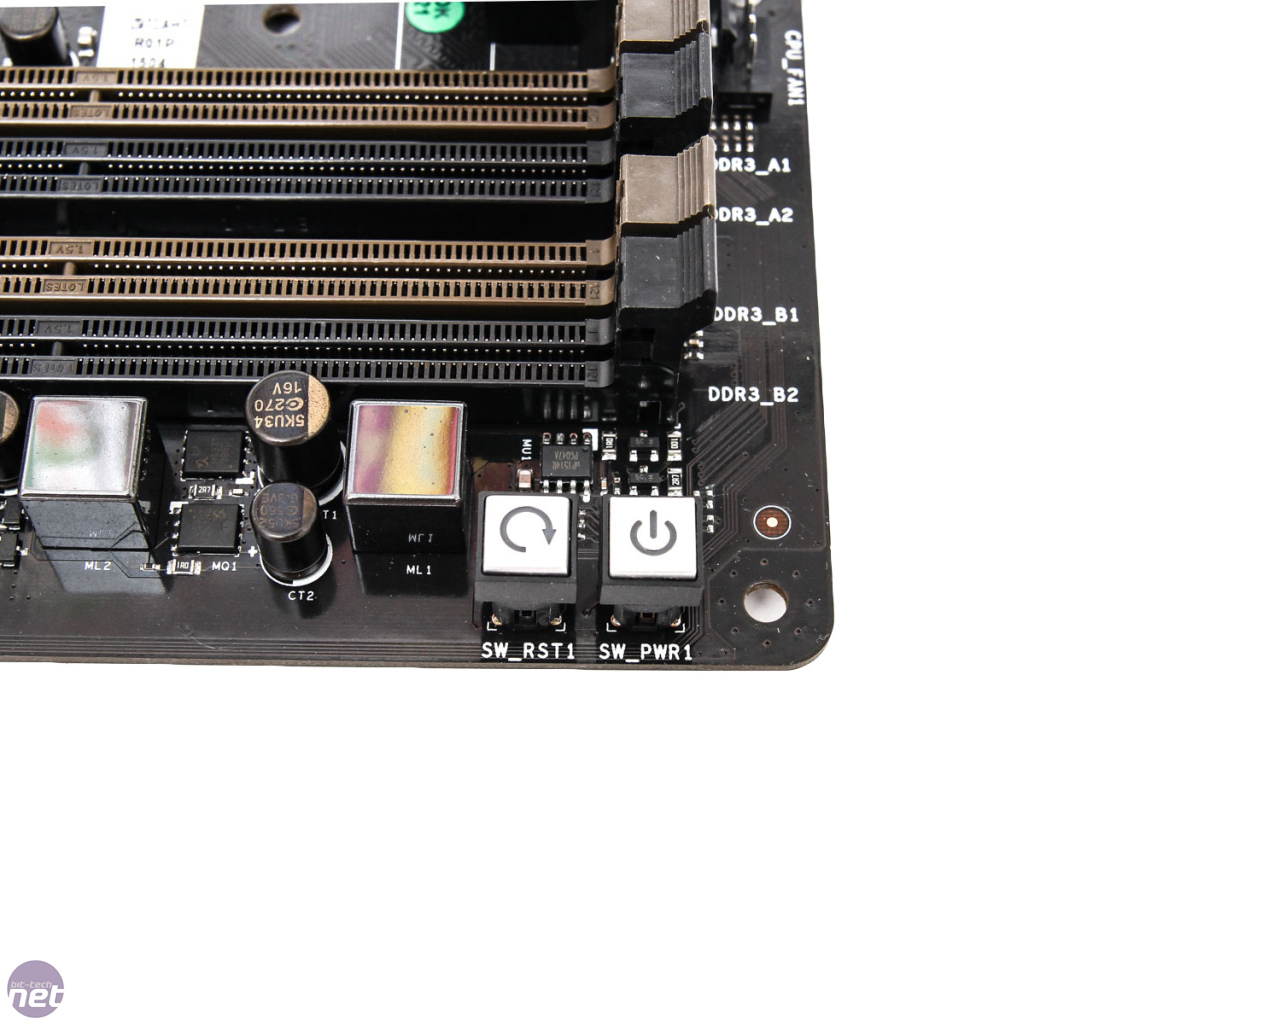 Biostar Gaming Z97x Review Mainboard Buildup Lga 775 Ddr3 Click To Enlarge